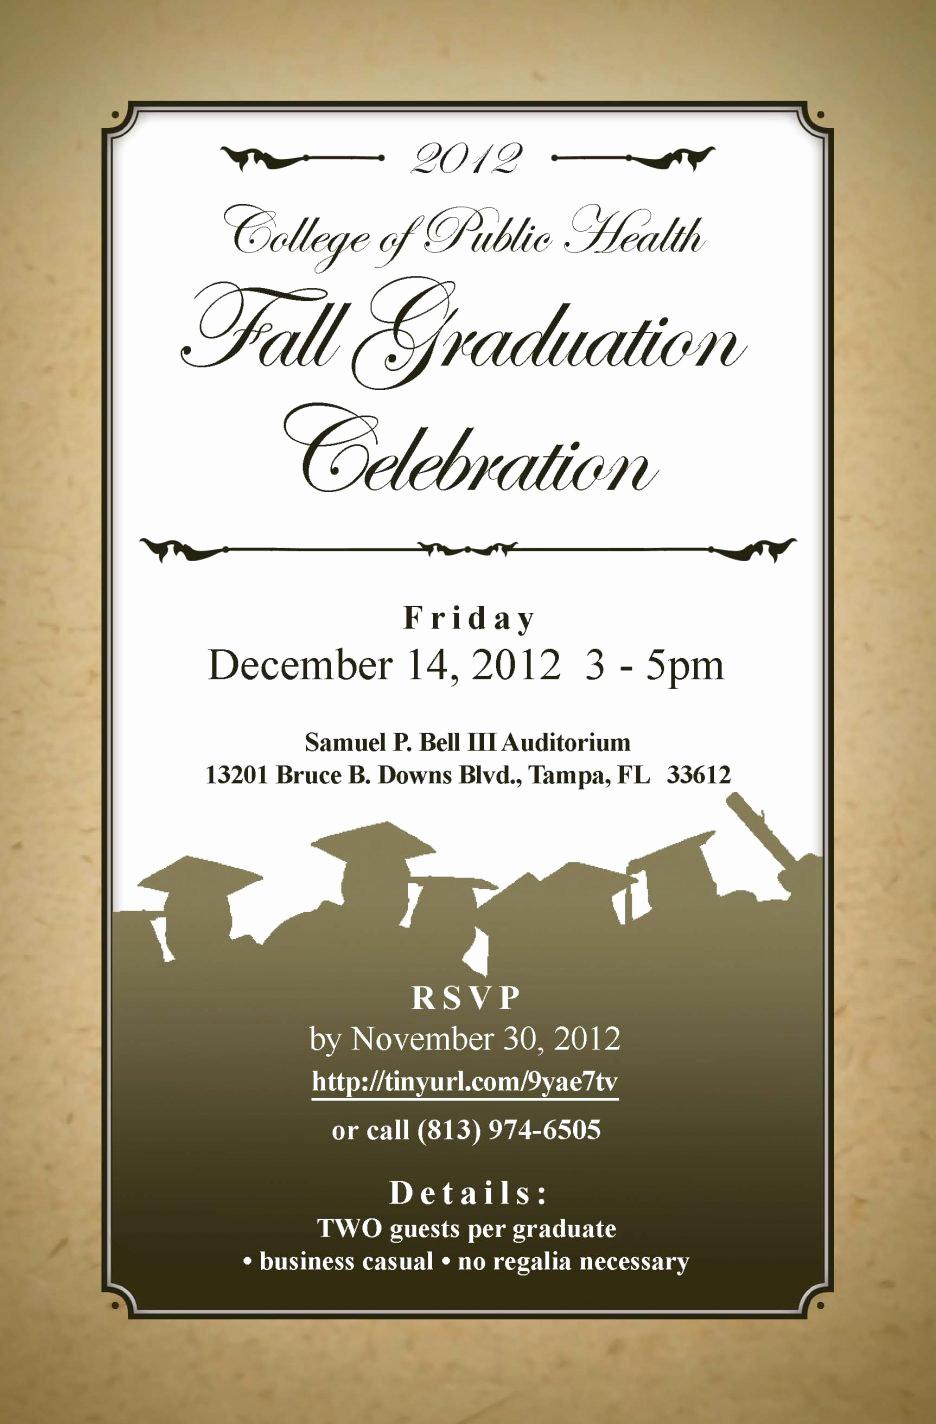 Graduation Dinner Invitation Template Inspirational Graduation Dinner Invitation